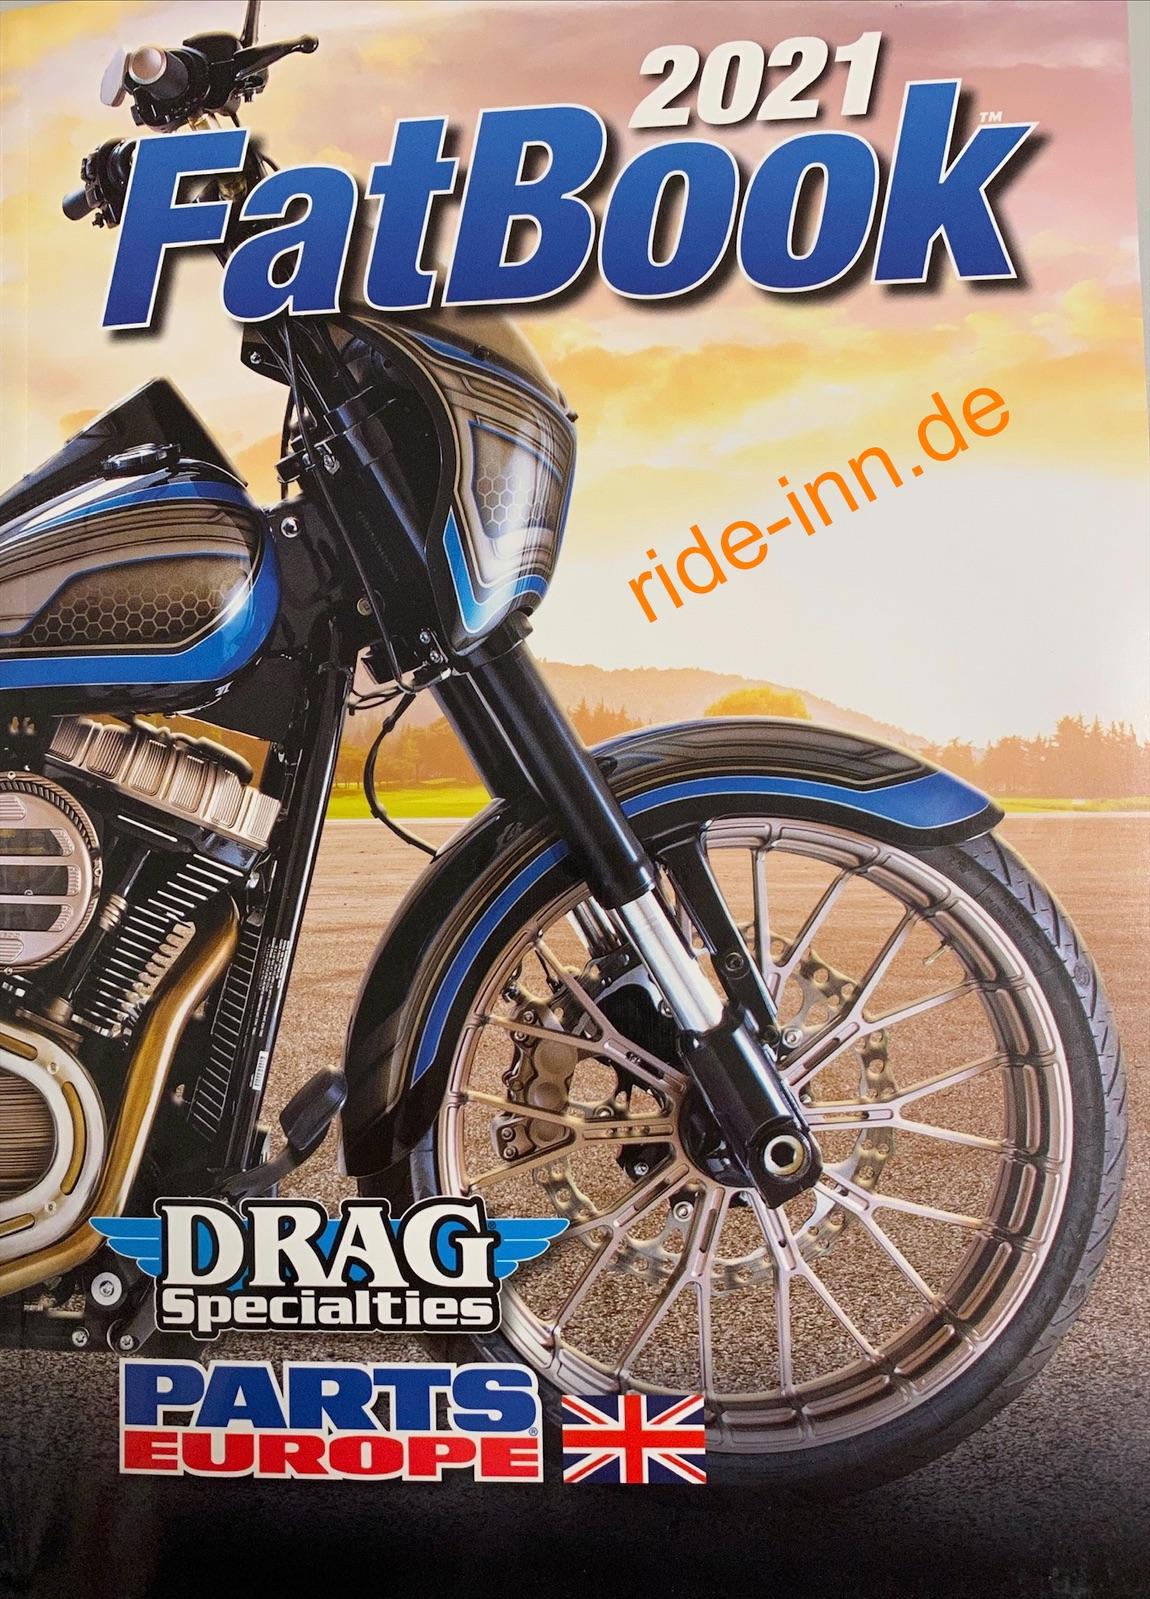 drag specialties katalog catalog